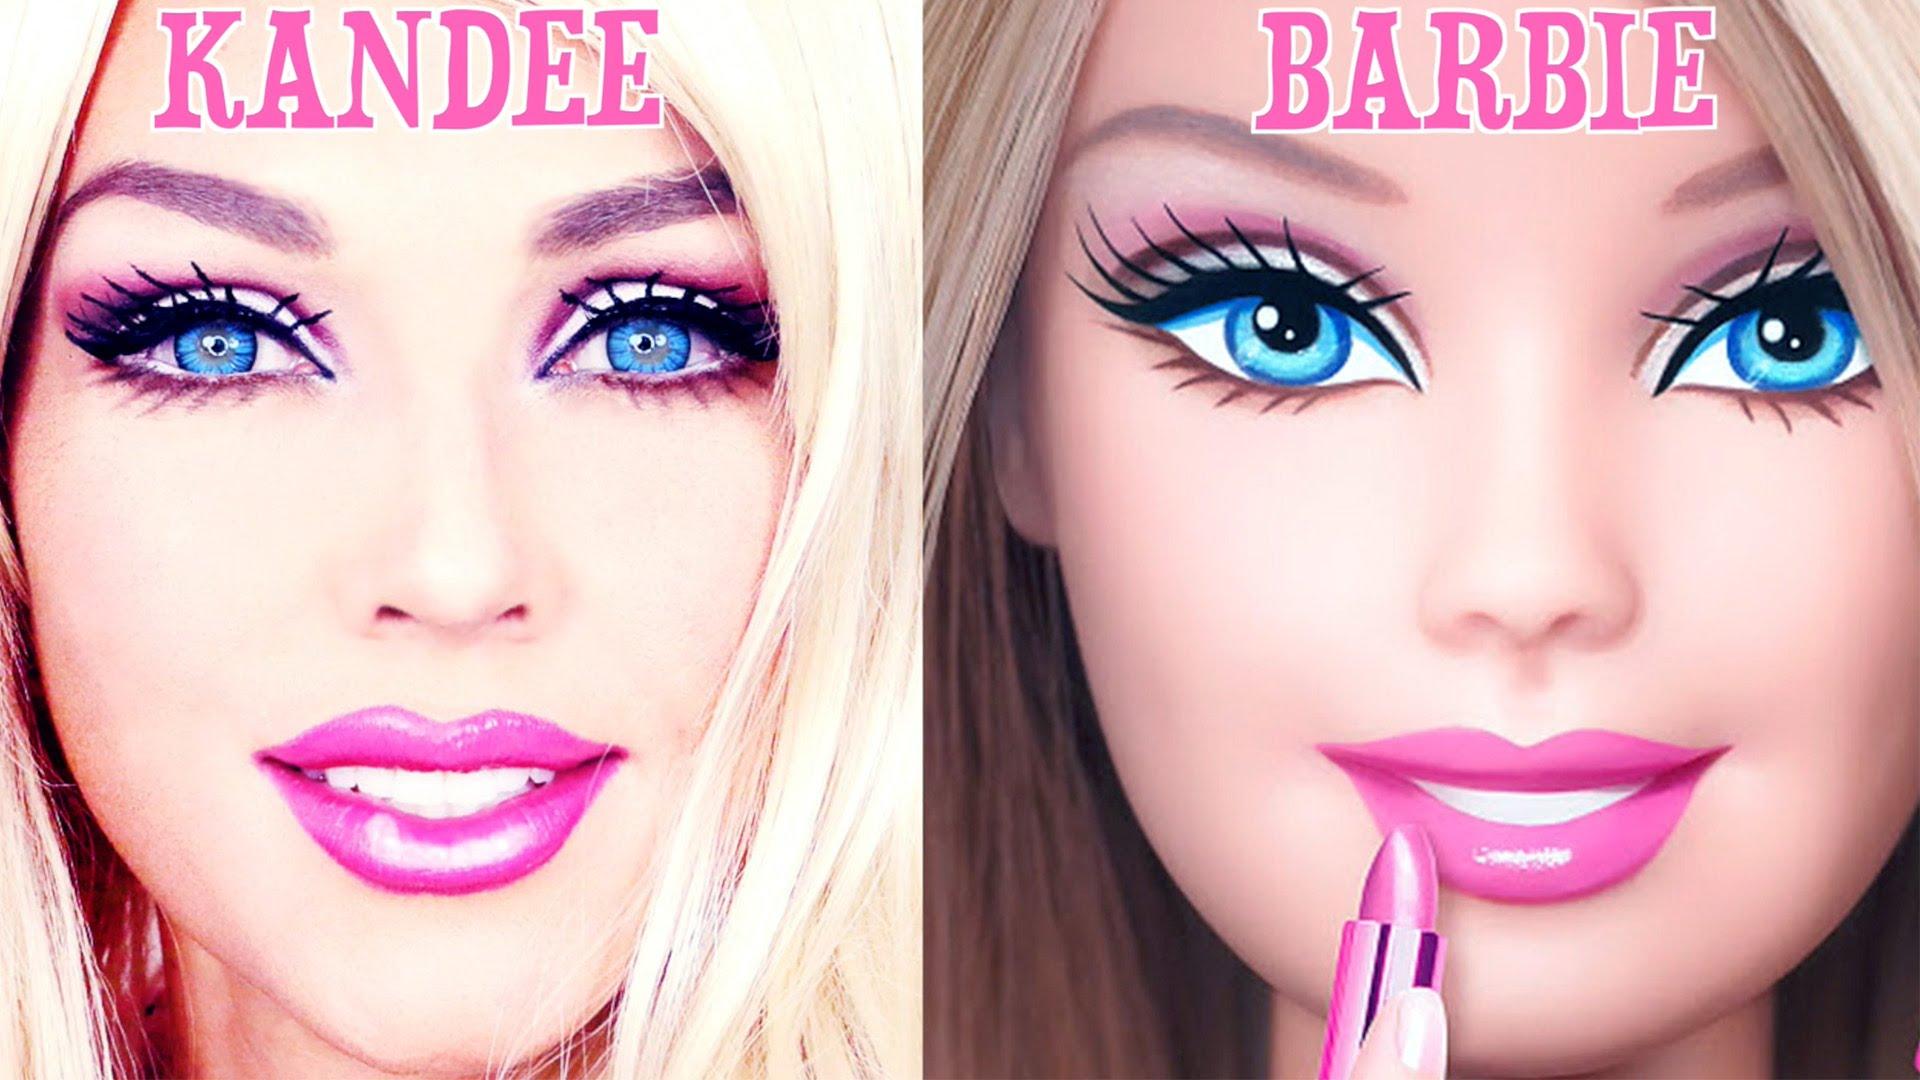 kandee_barbie.jpg